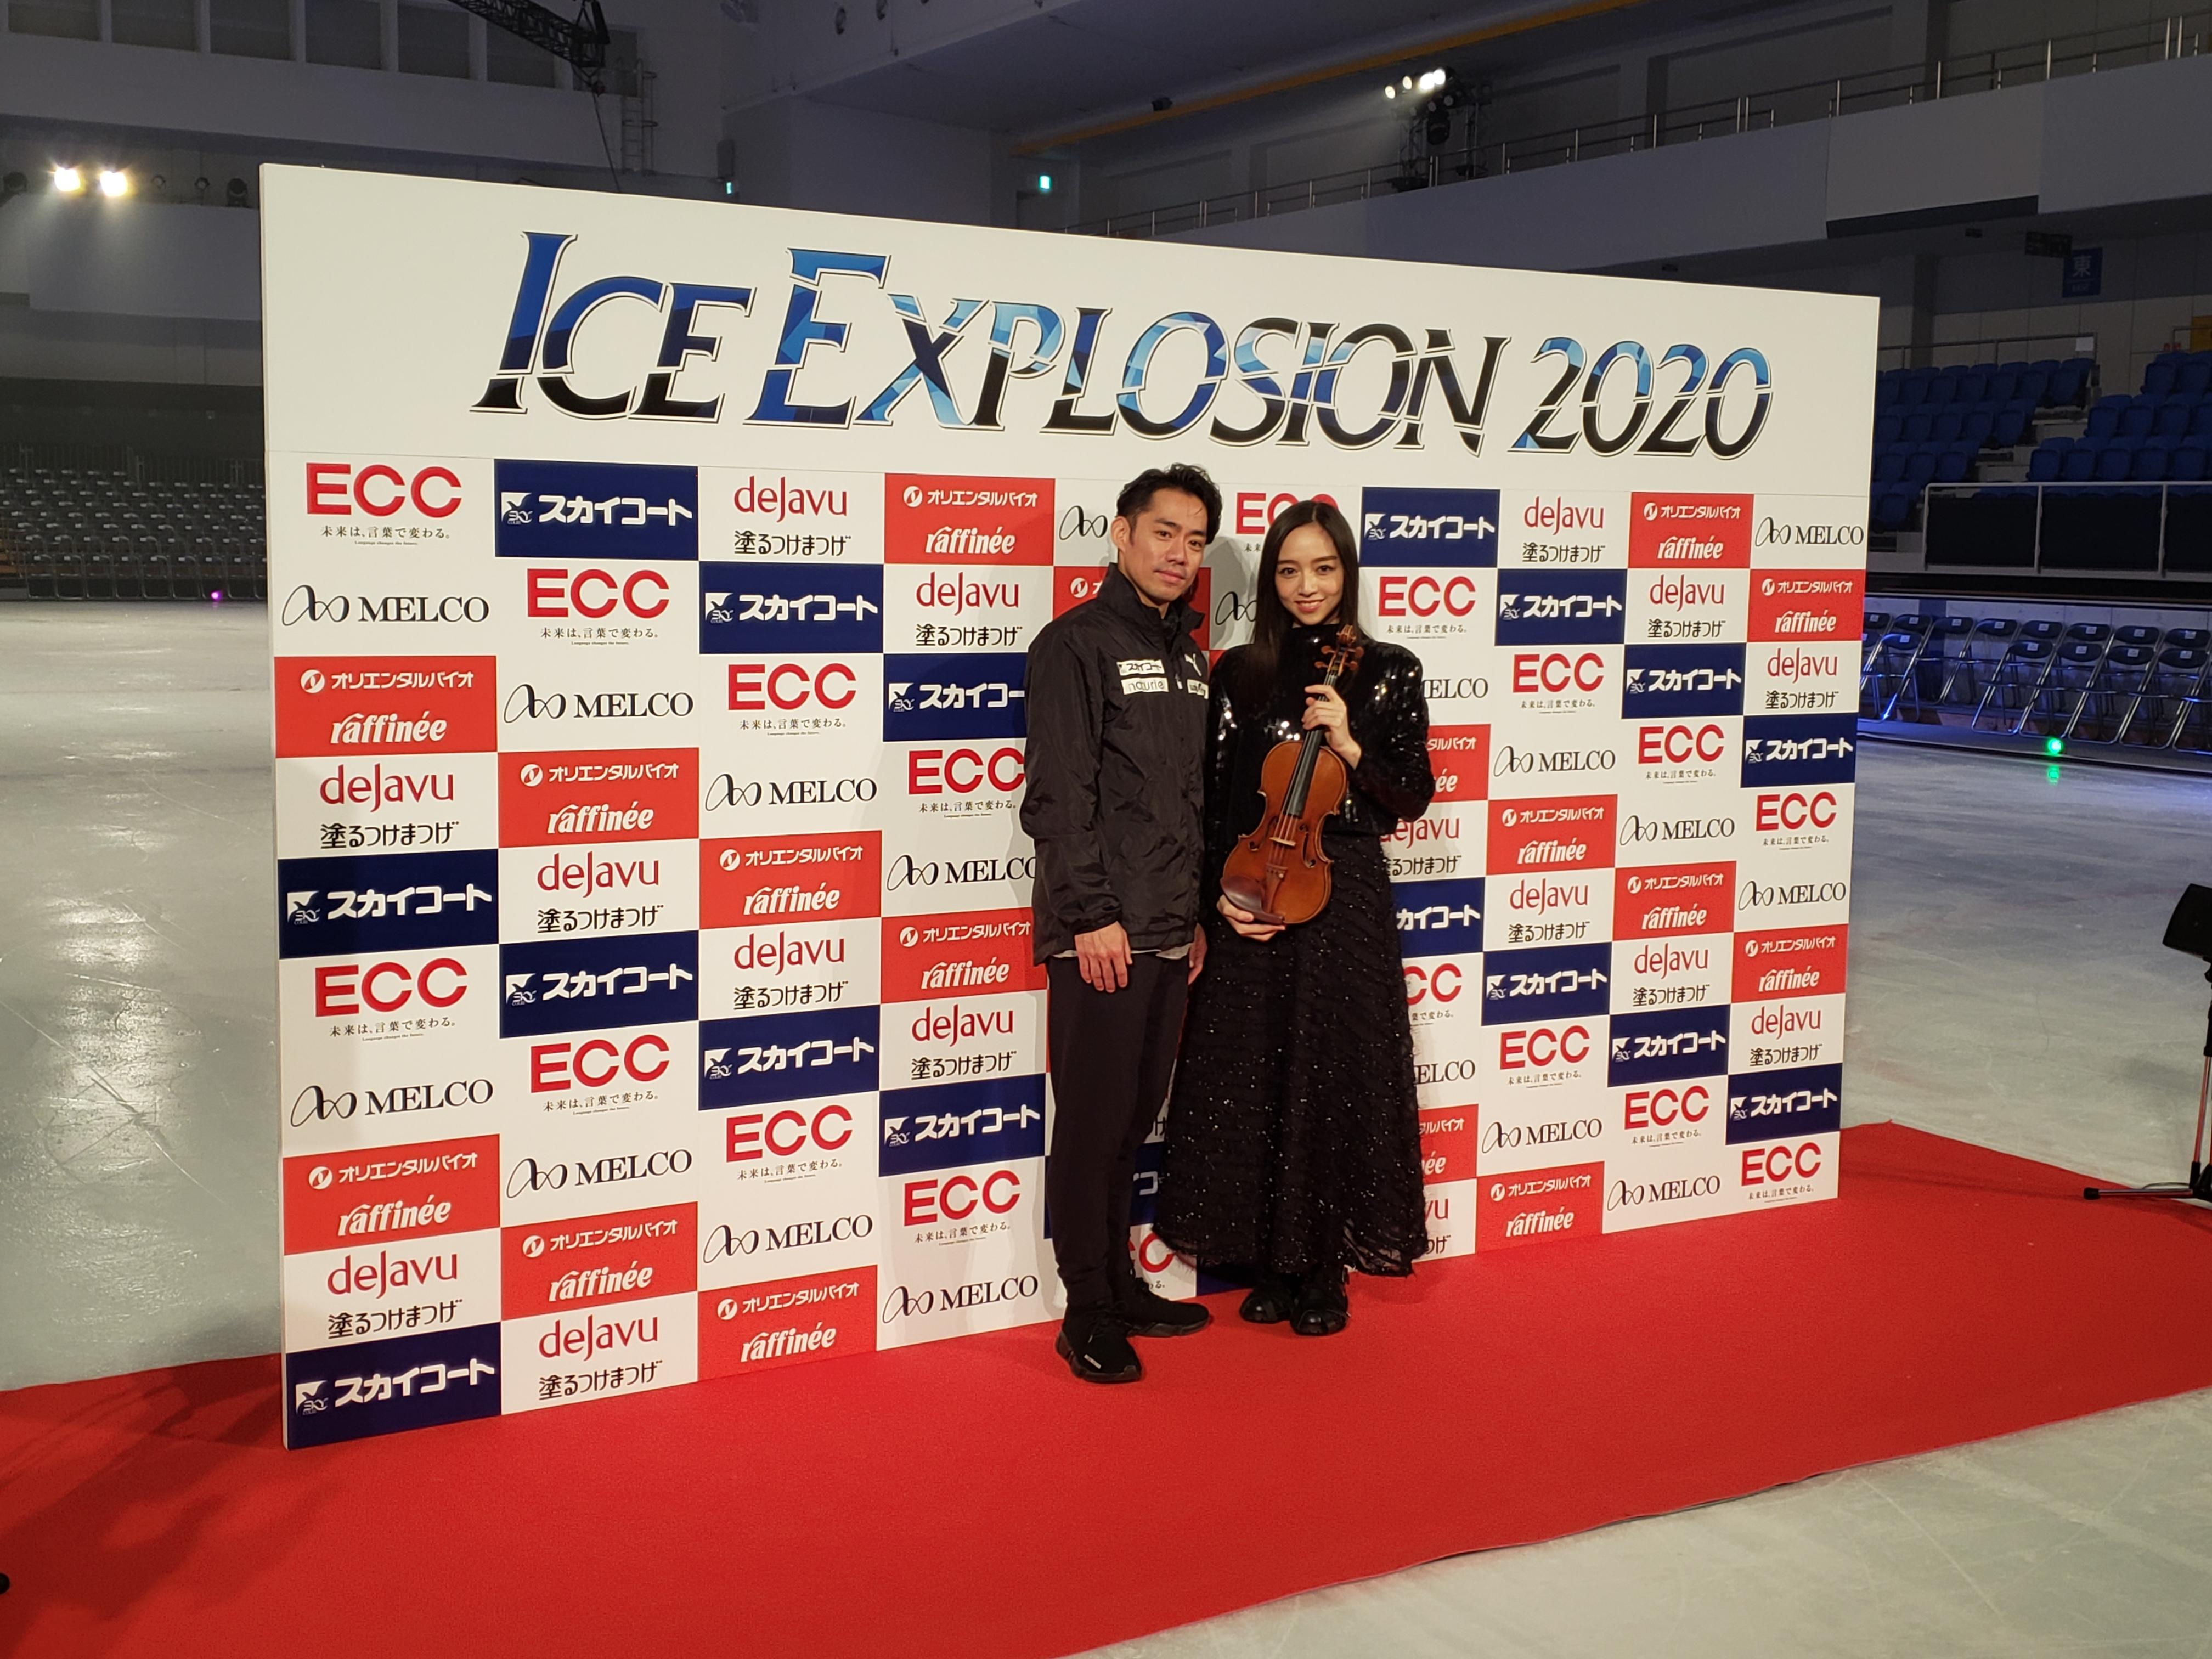 Дайсуке Такахаси - Страница 5 EN53Z-CVUAALZlr?format=jpg&name=4096x4096